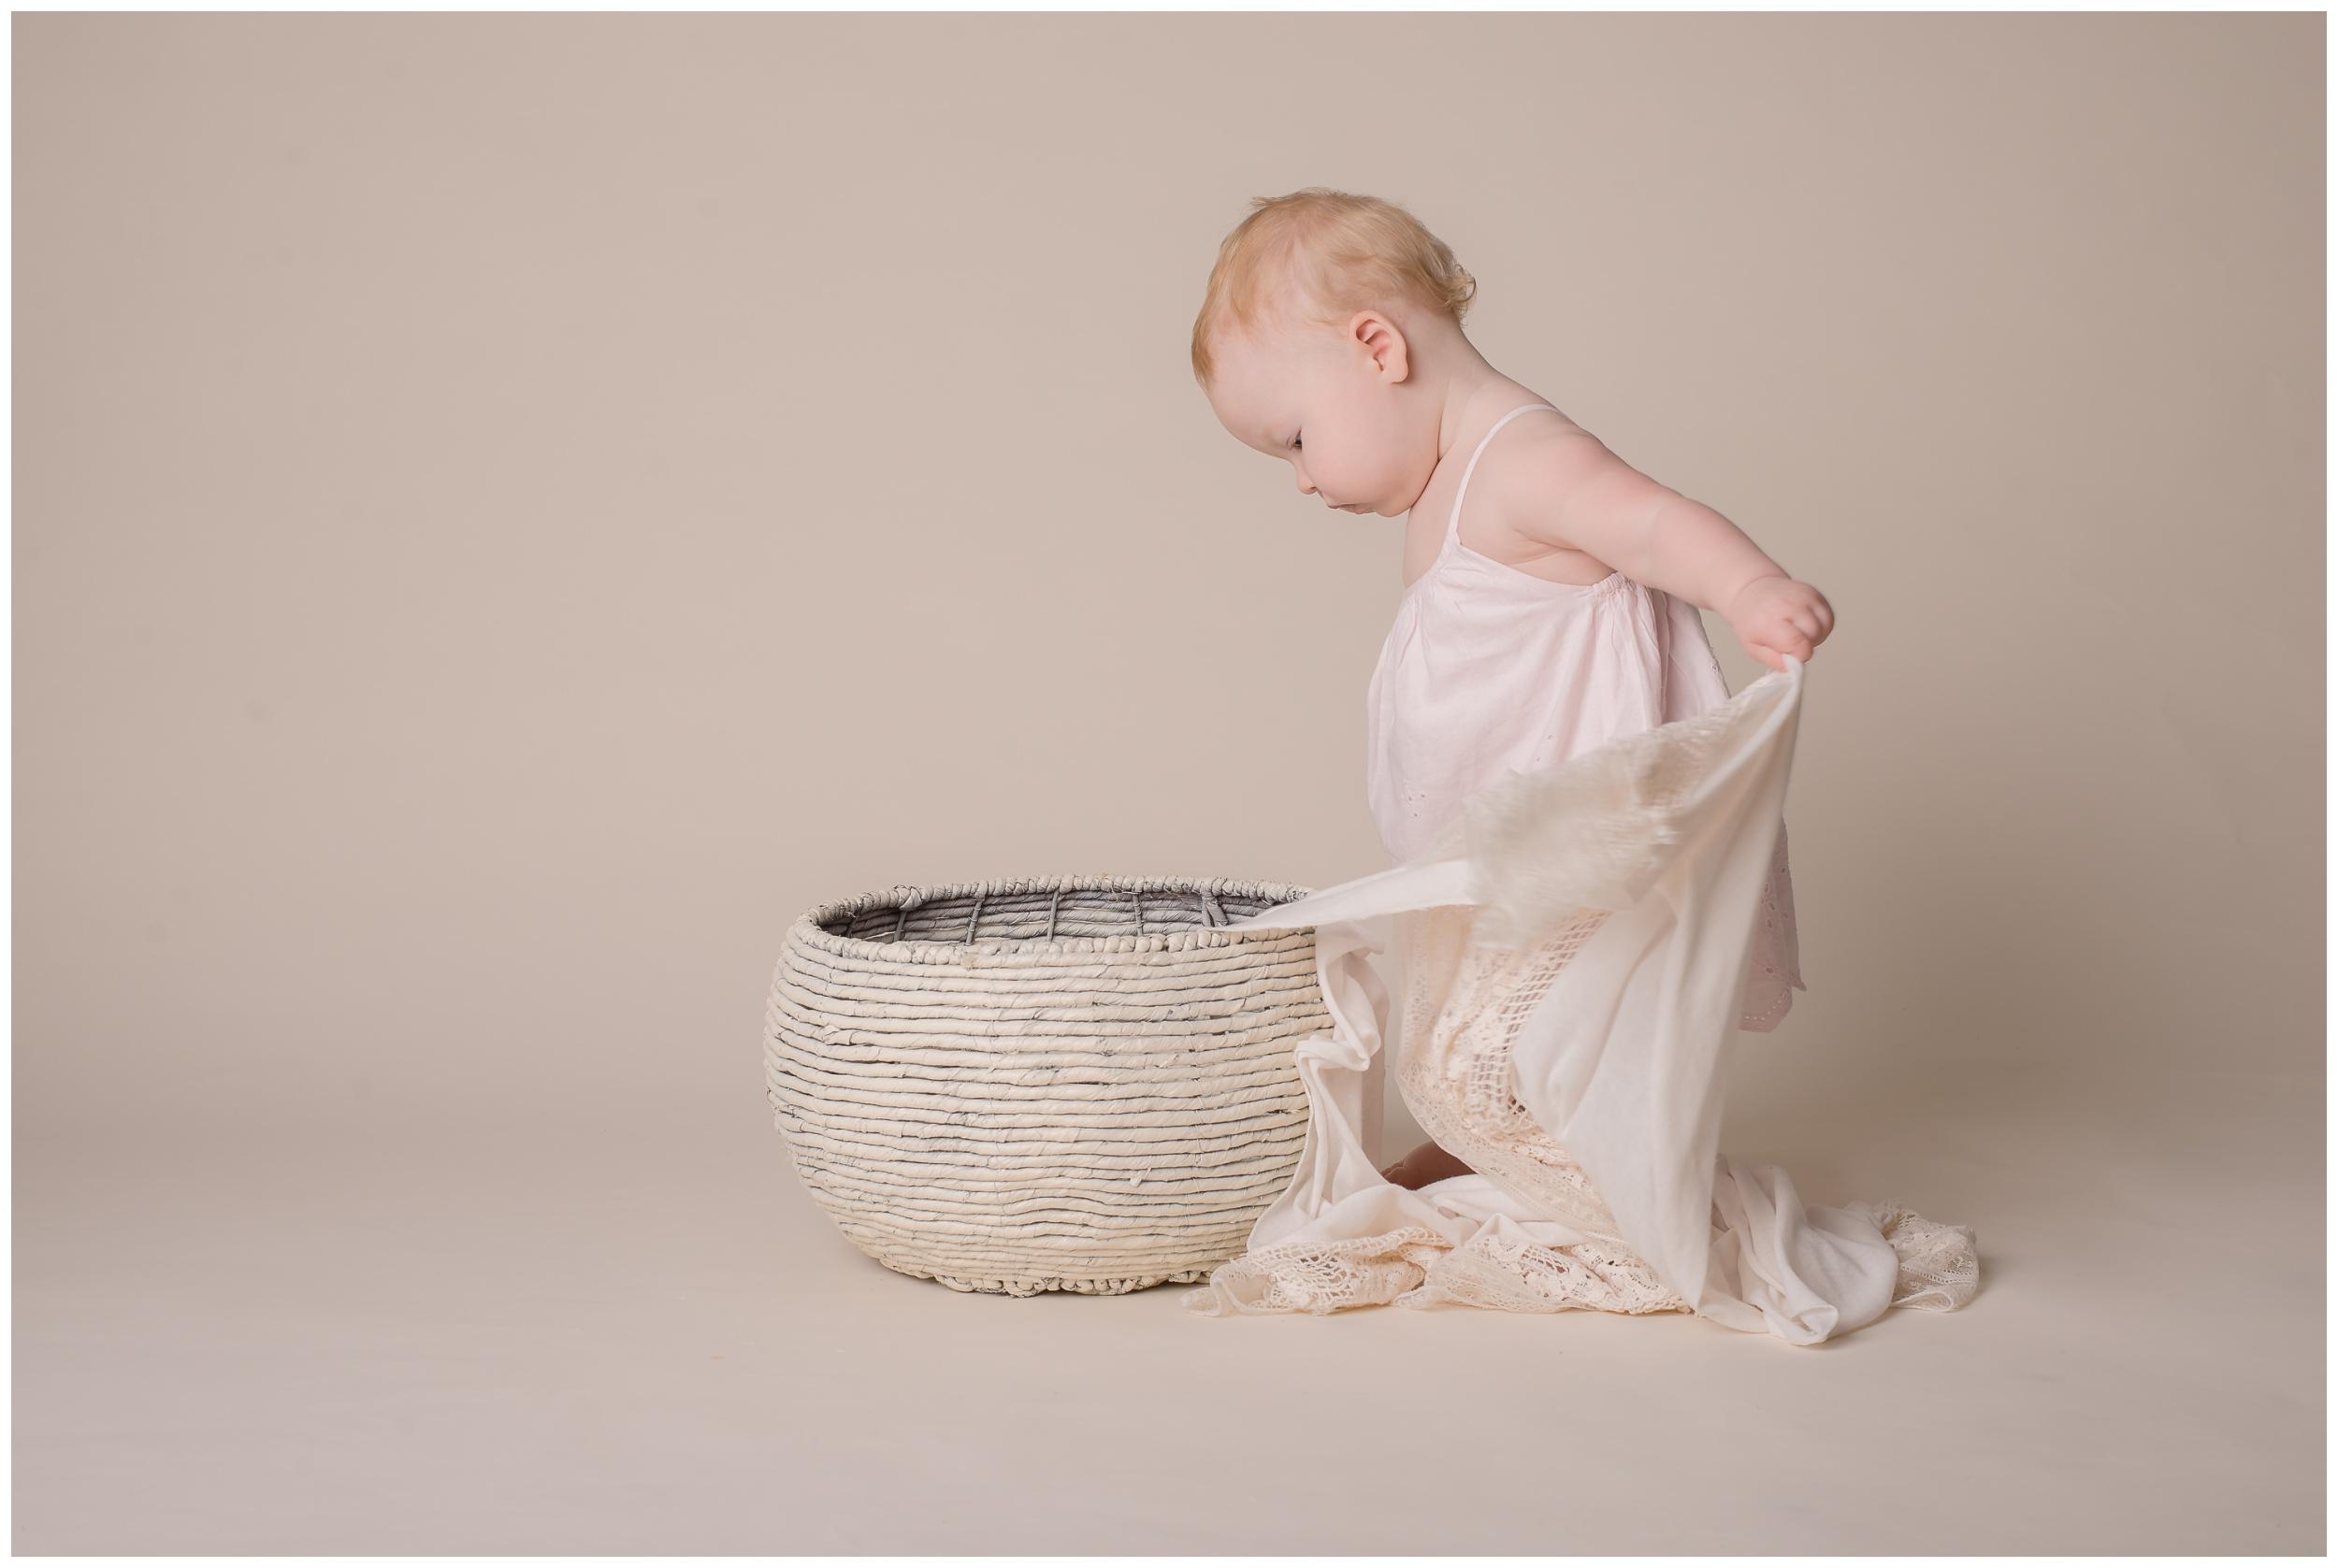 south_bend_Granger_Niles_Newborn_photographer_ashleywentzphotography_0269.jpg